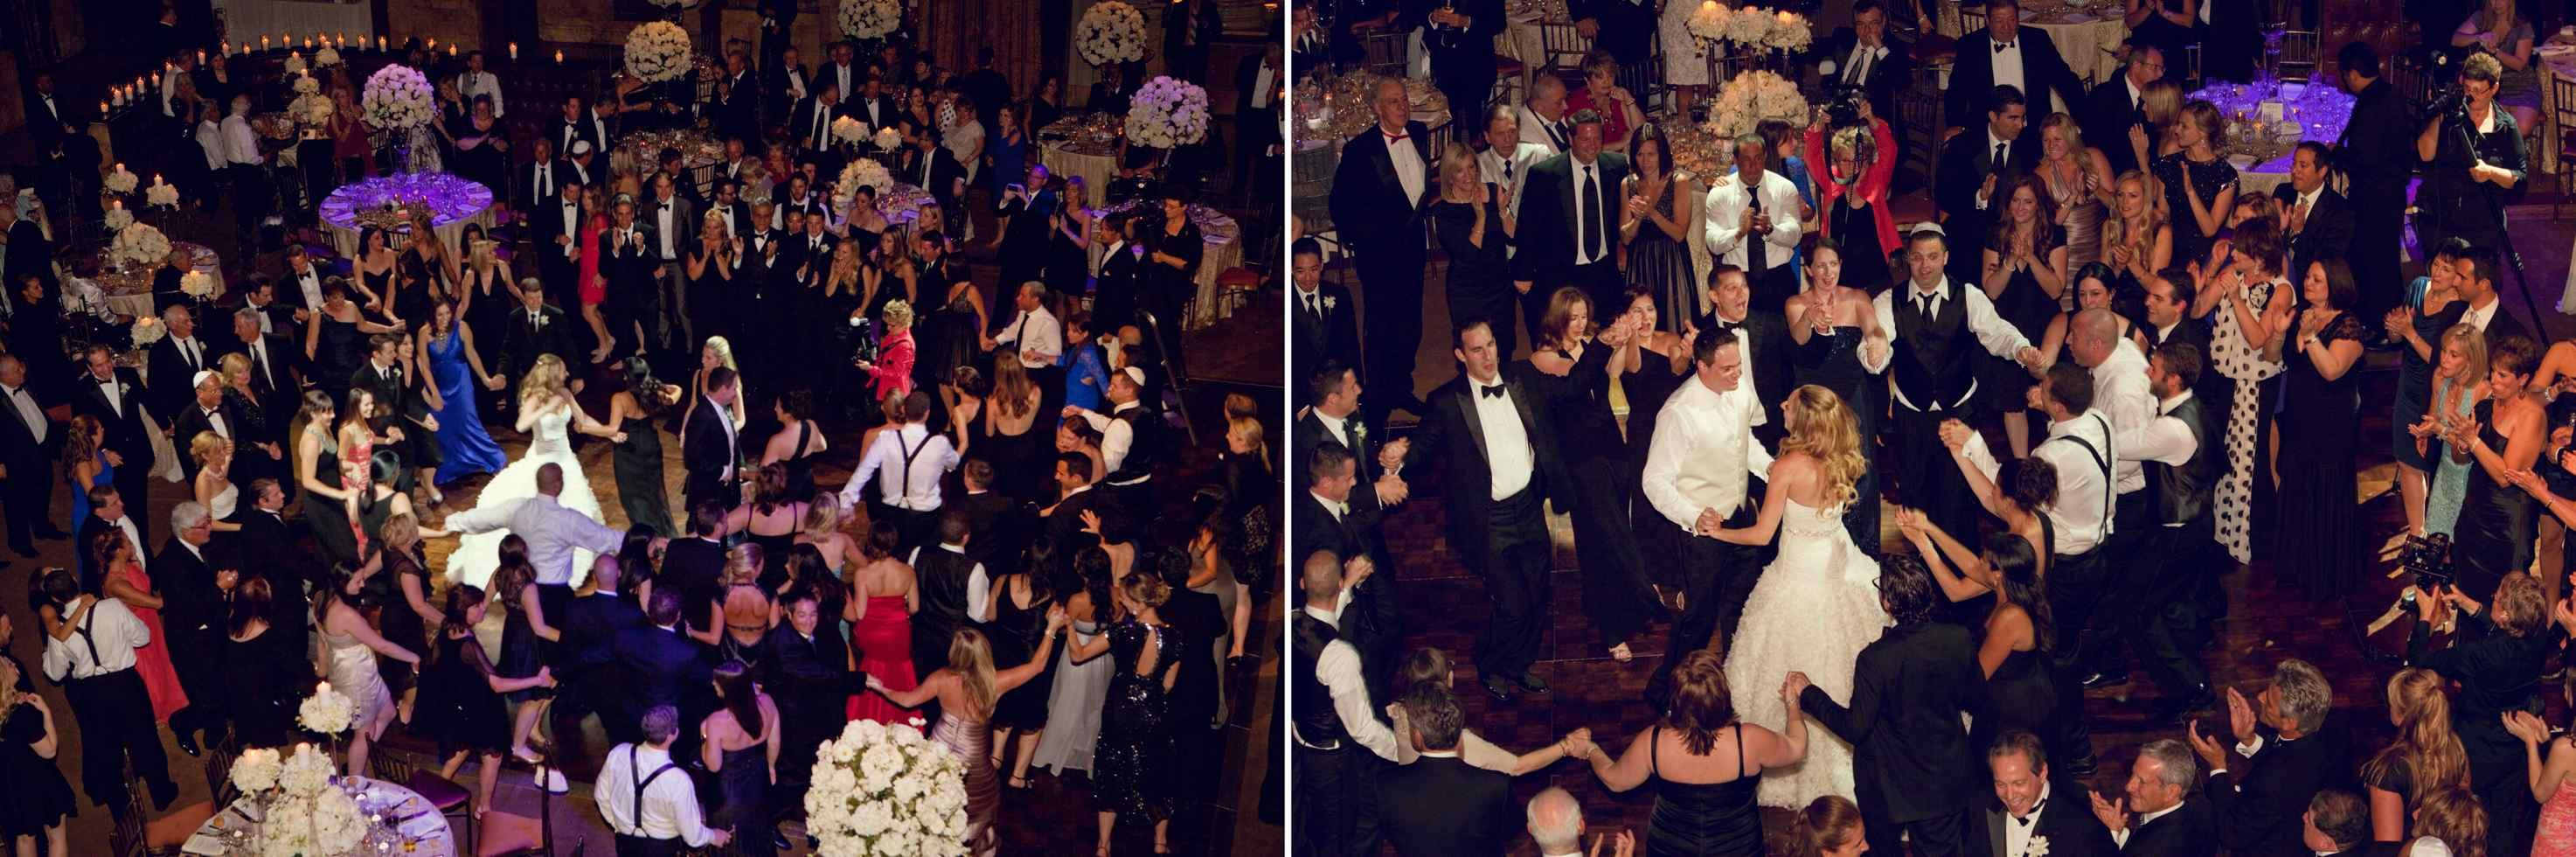 dancing_wedding.jpg